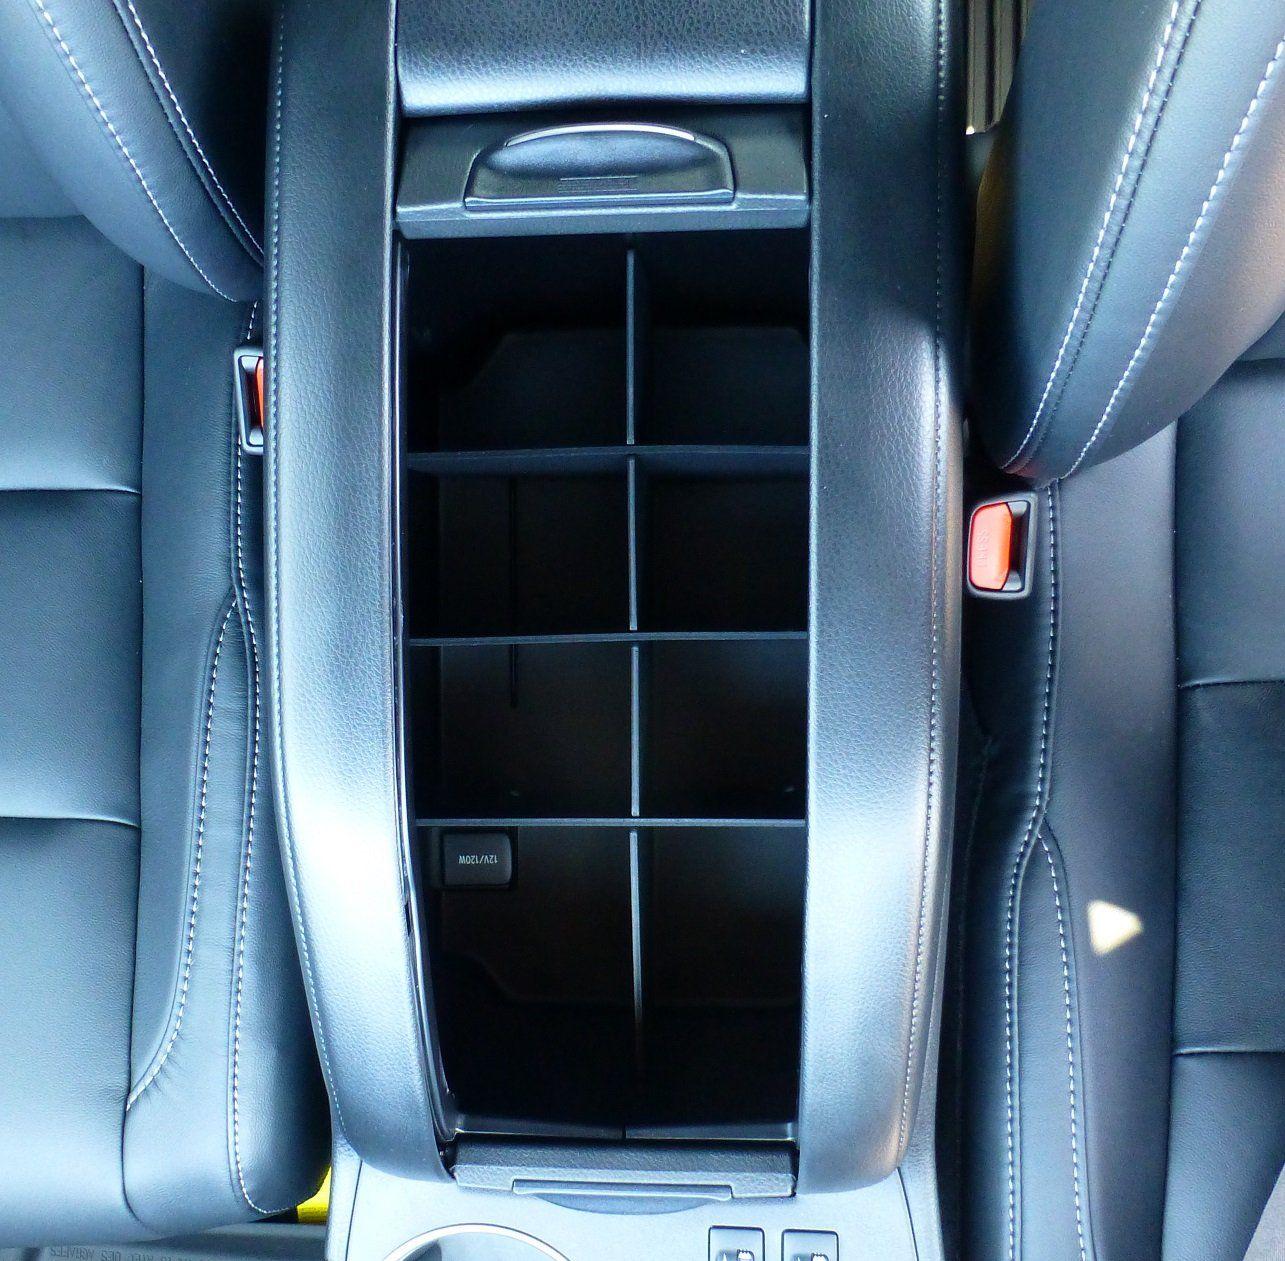 Vehicle Ocdâ Organized Console Device Toyota Highlander Center Organizer 20172018 Made In Usa